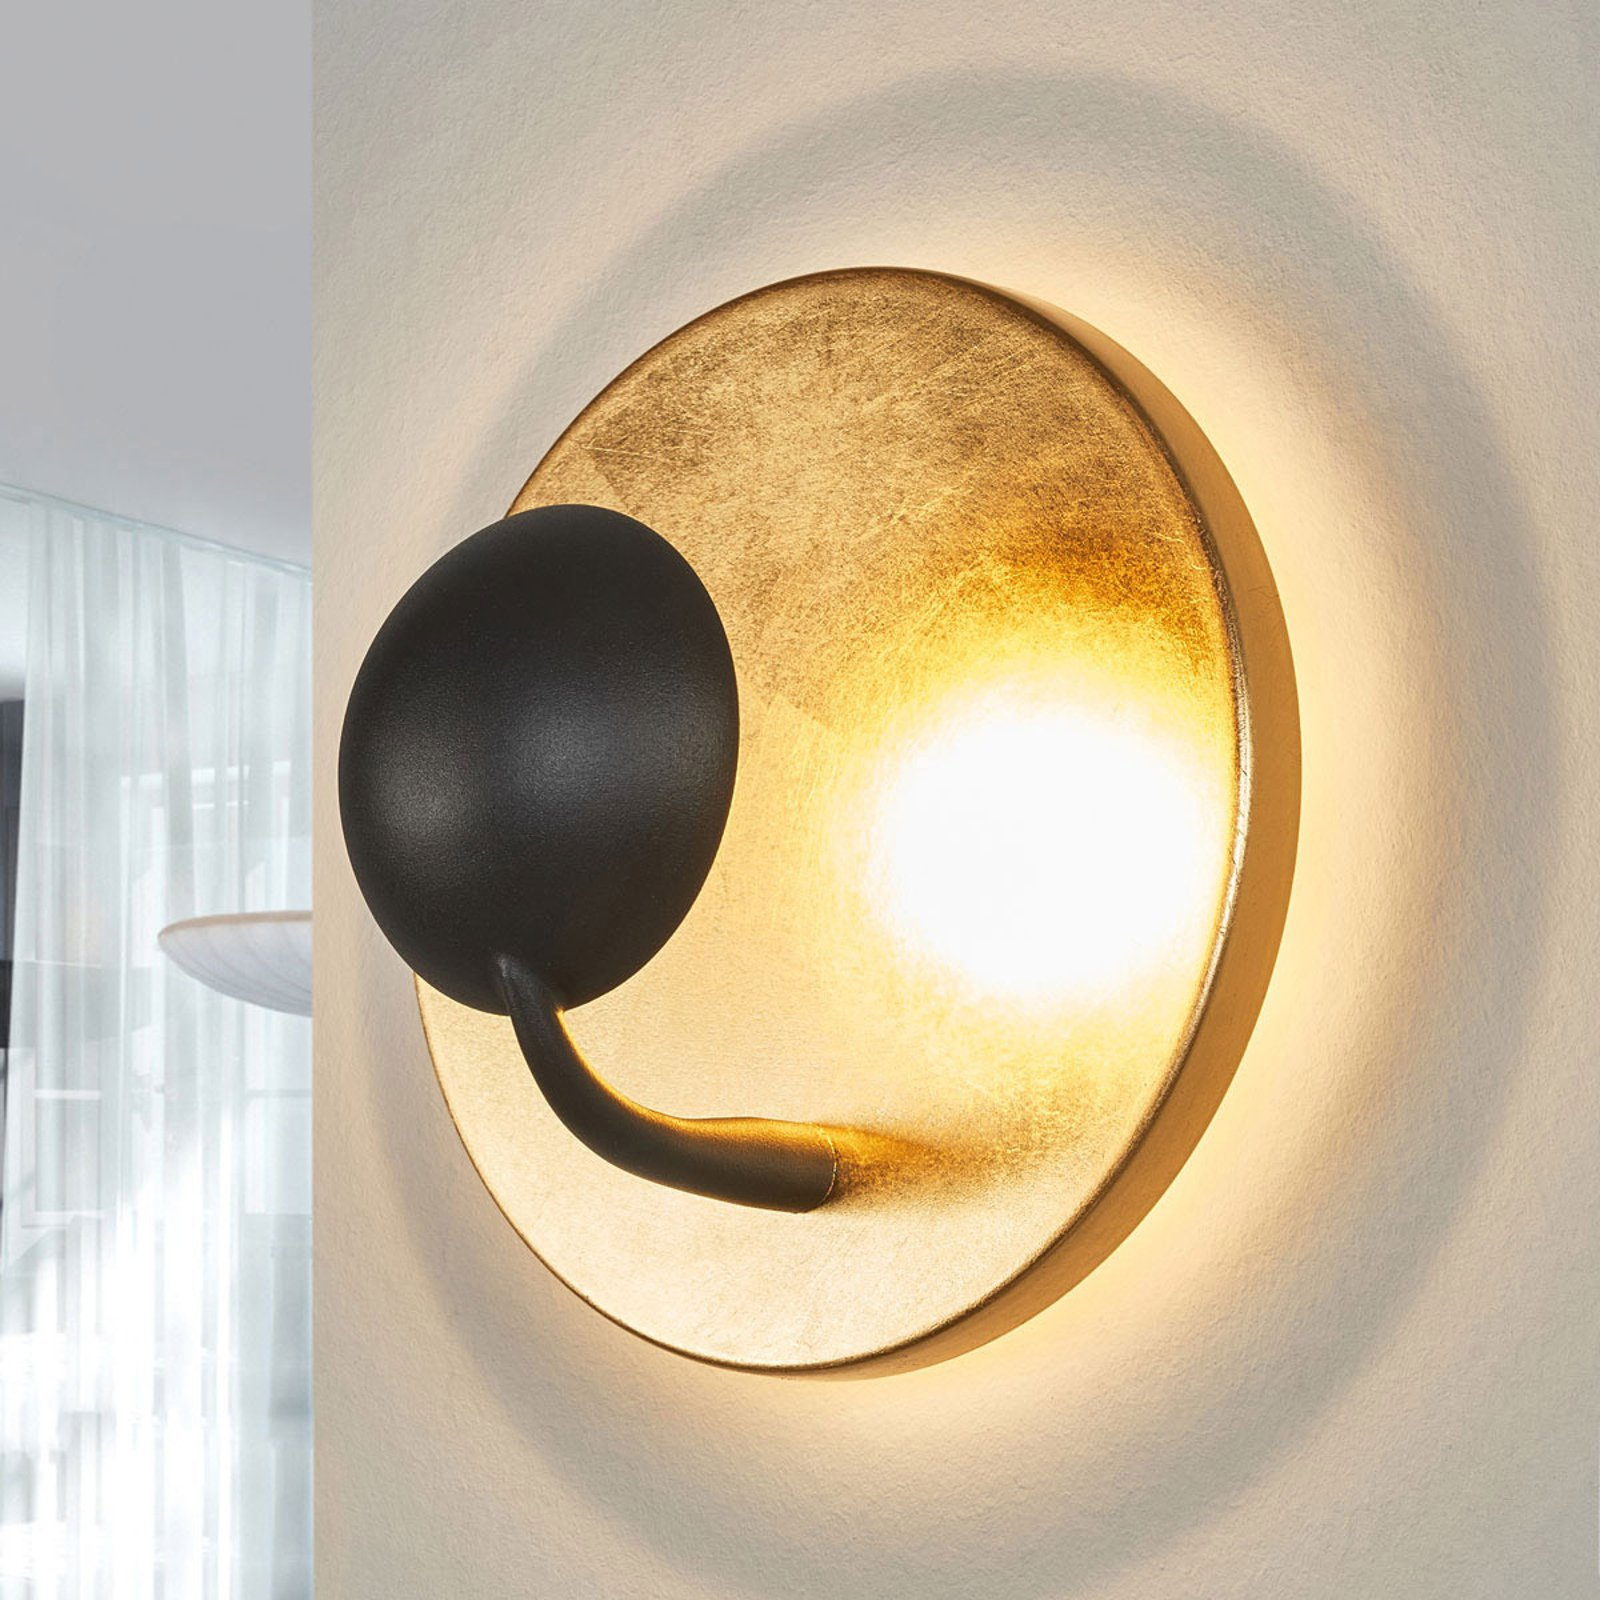 Ekstravagante LED-vegglampe Aurora svart-gull